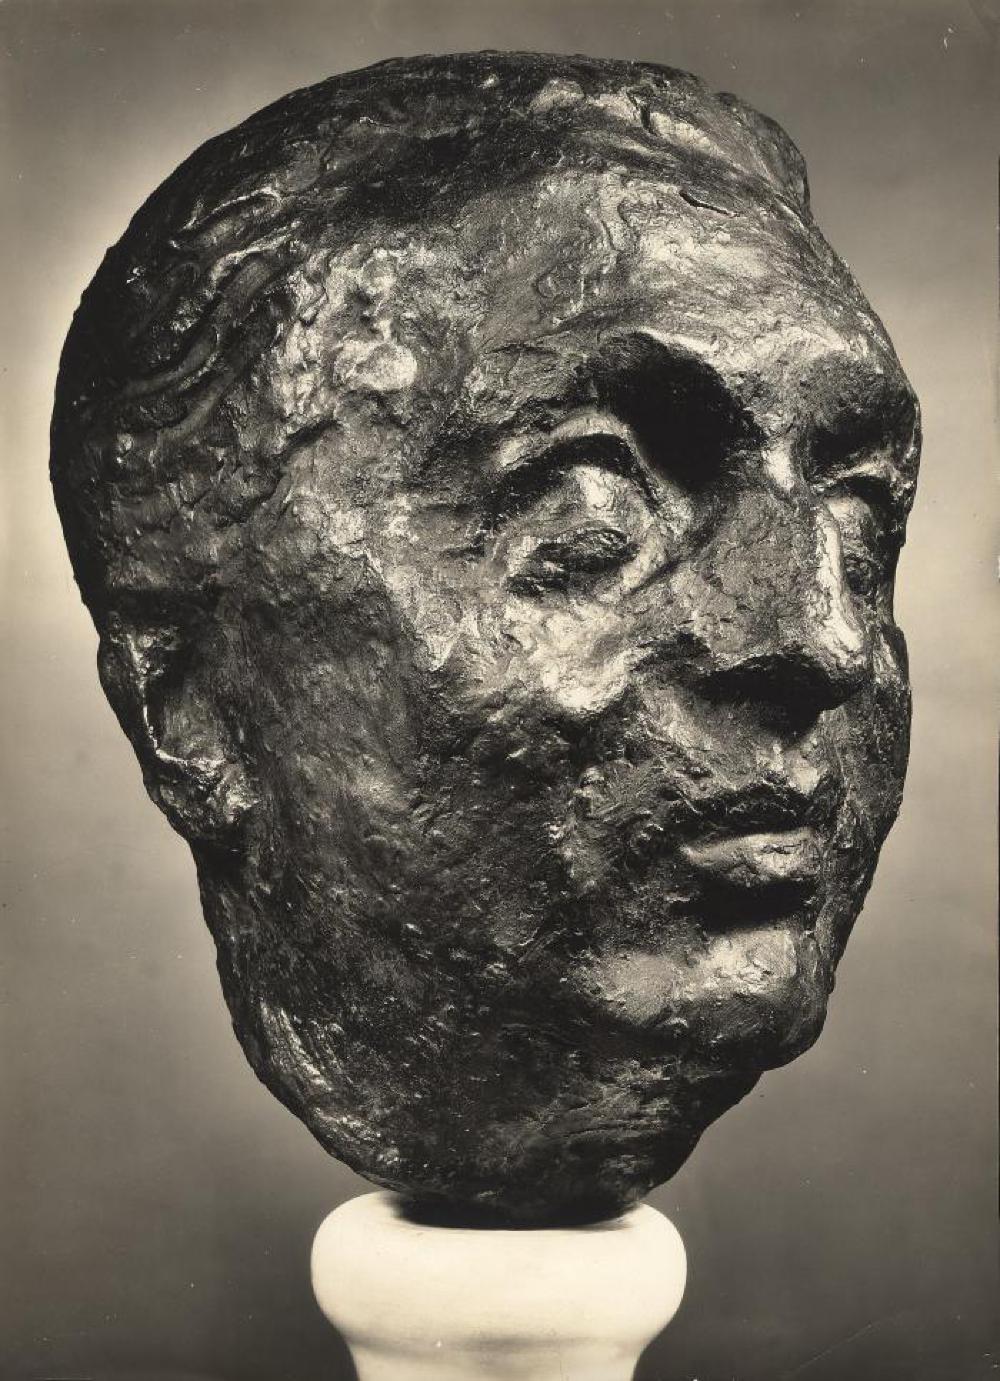 J. B. Neumann, image 5